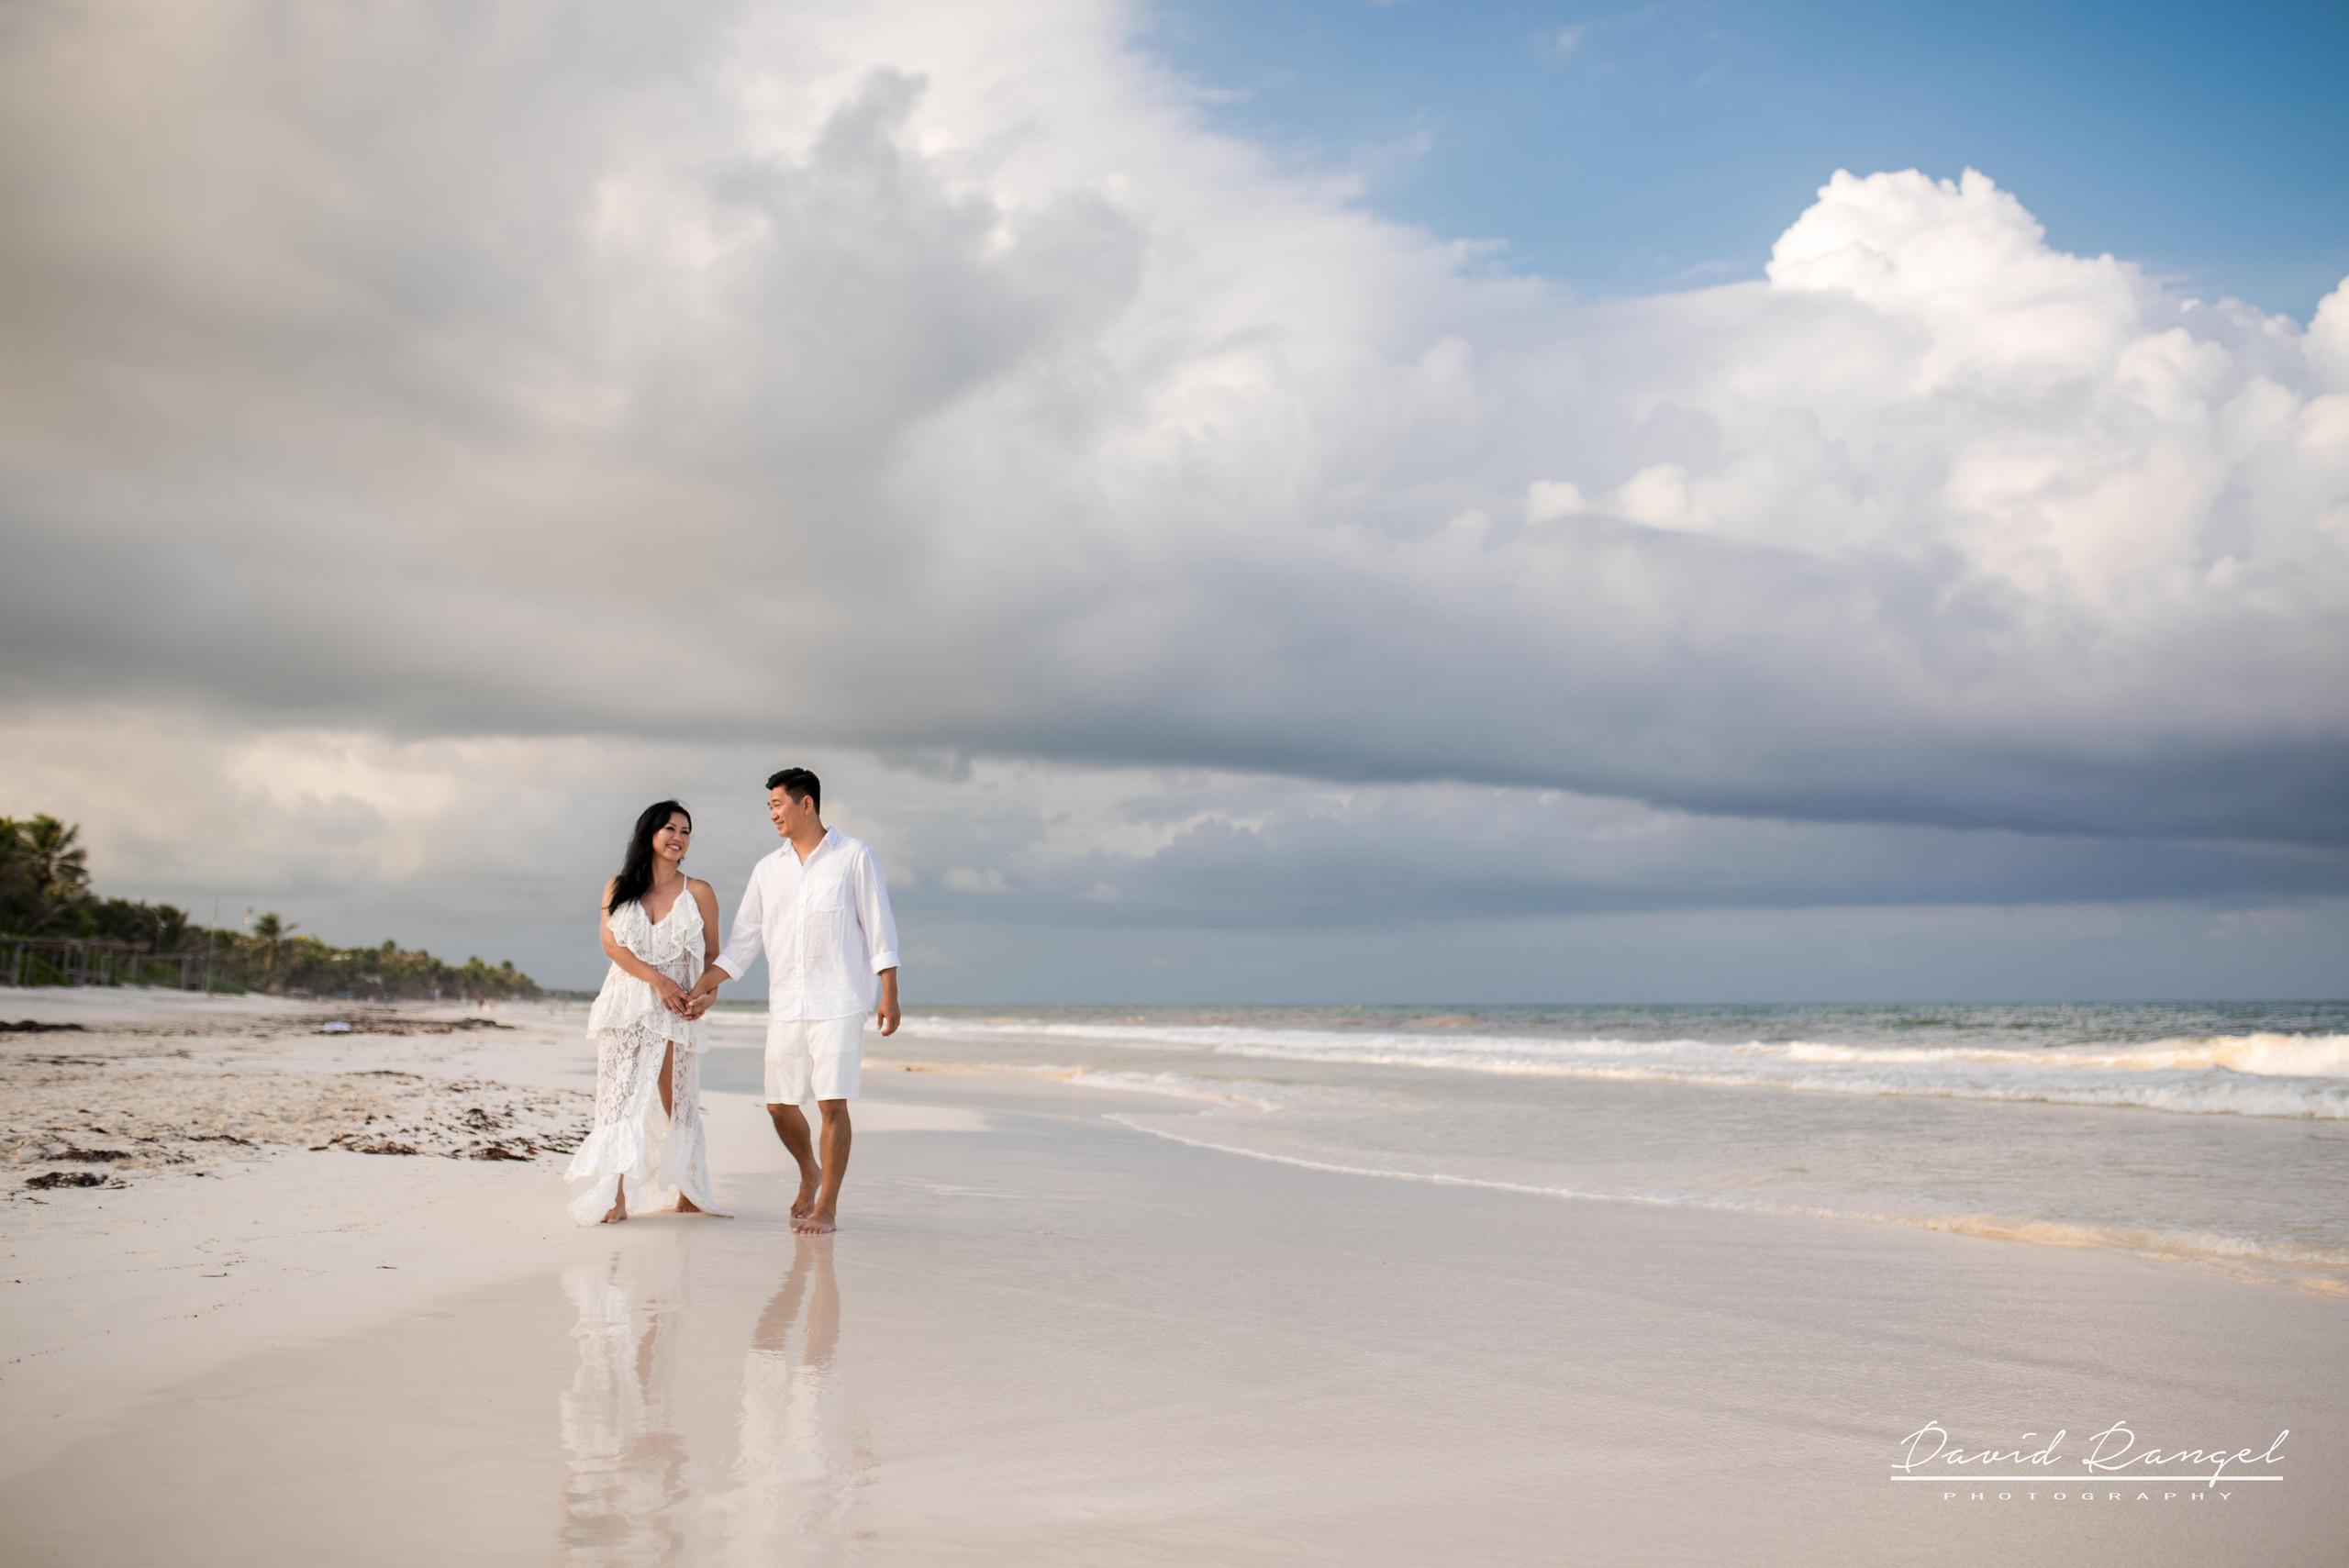 engagement+session+photo+picture+beach+caribe+tulum+love+romantic+happy+hotel+sanara+sunset+professional+photographer